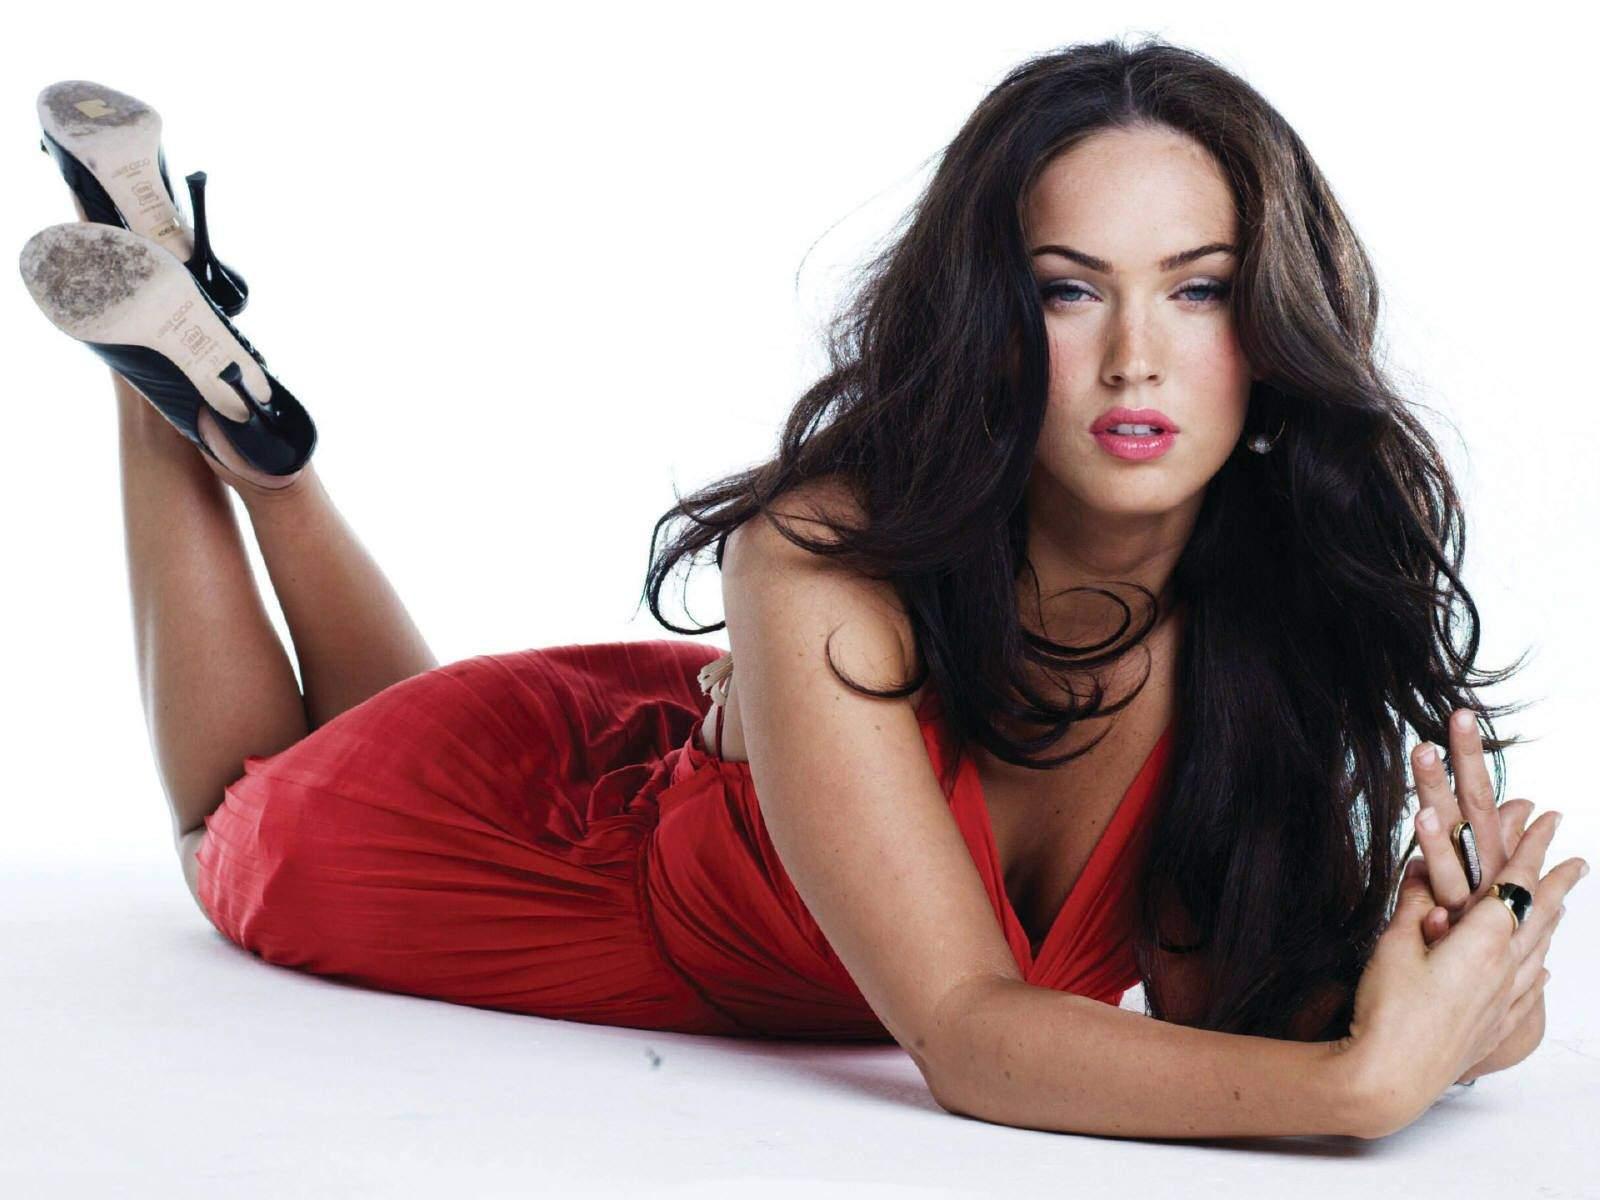 Megan fox sexy picture 2